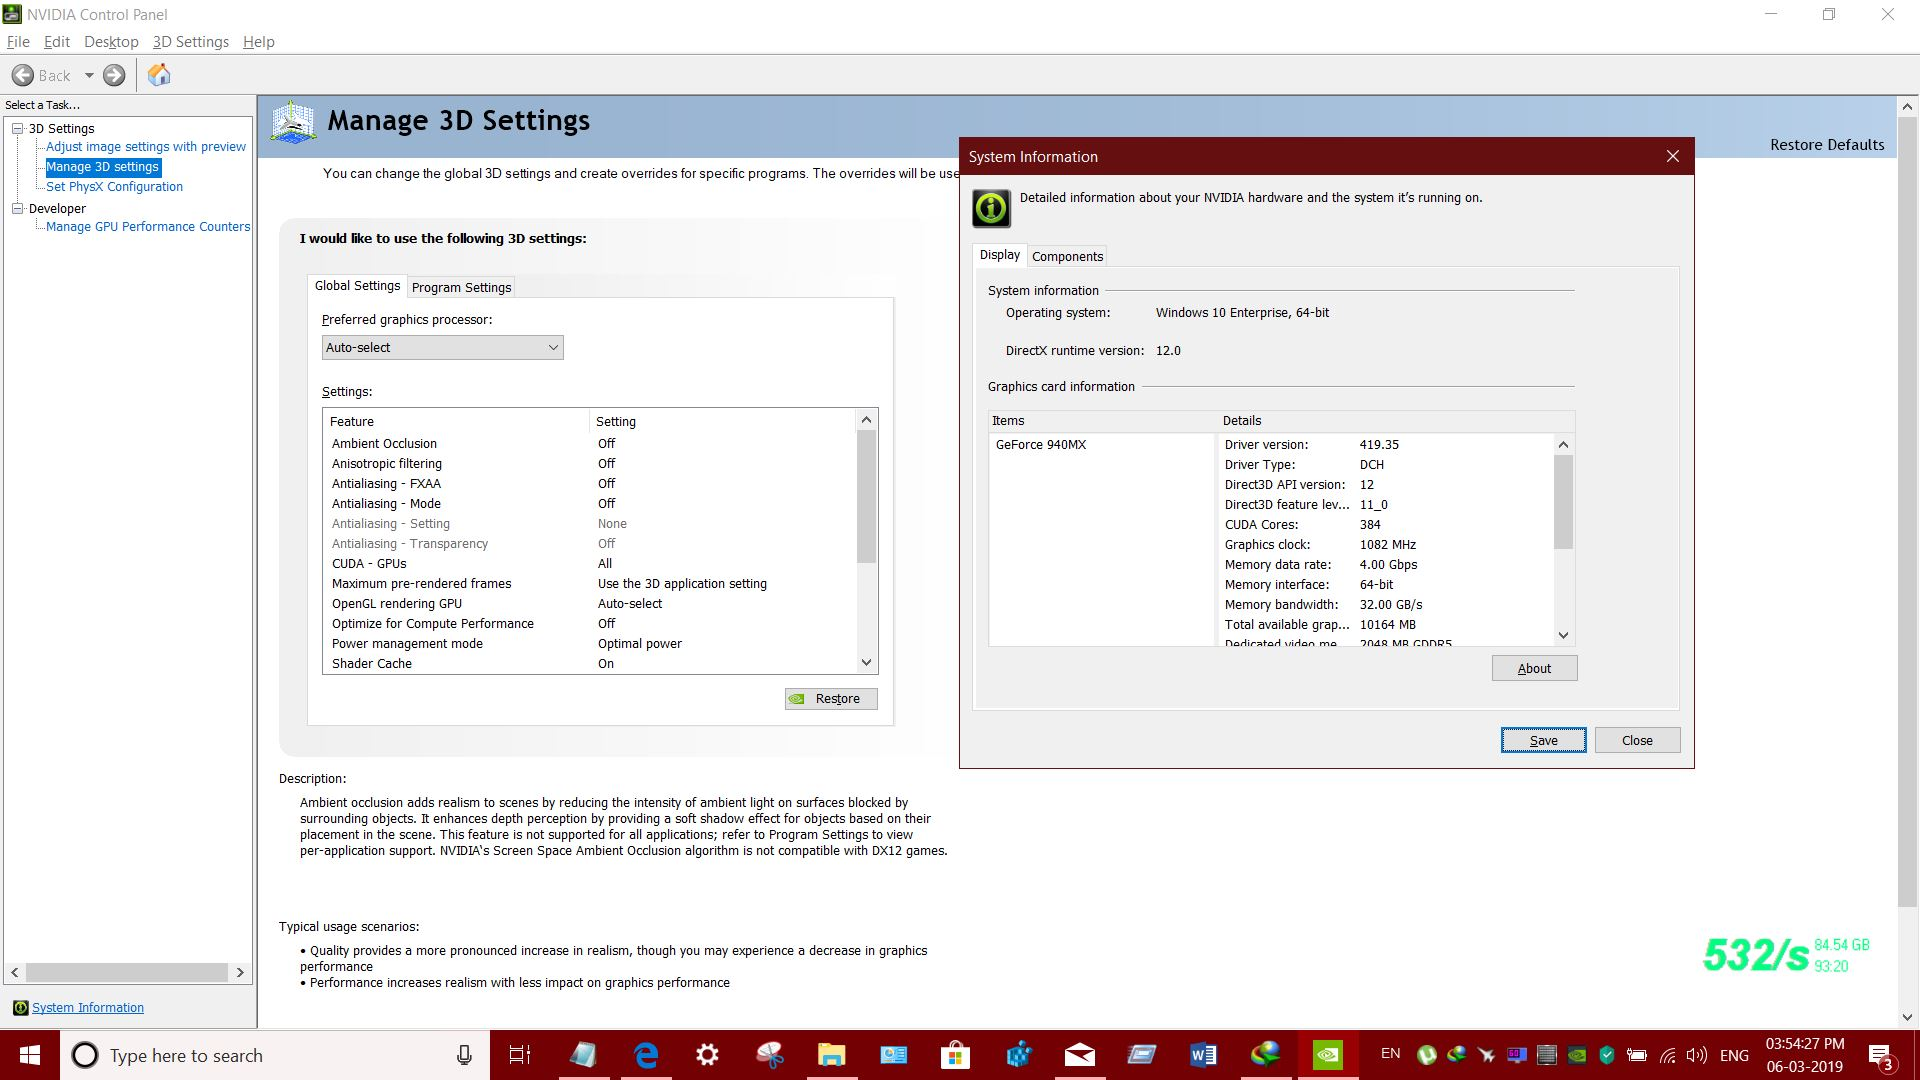 NVIDIA RELEASED NEW GEFORCE DCH & STANDARD WHQL DRIVER V419